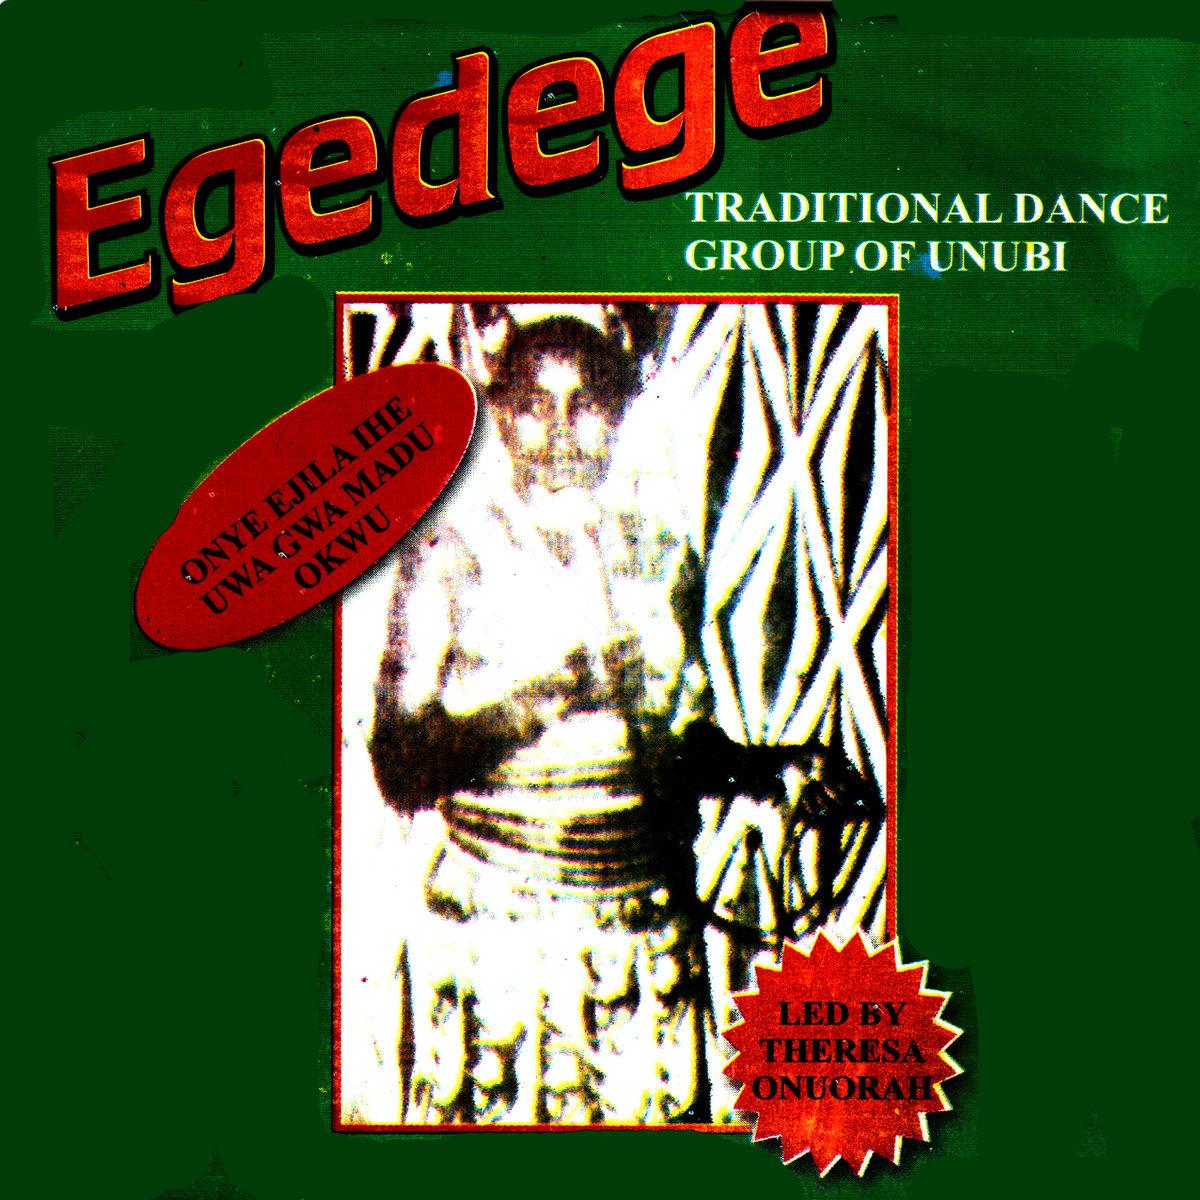 Egedege - Ijerem Irue (feat. Theresa Onuorah) mp3 download